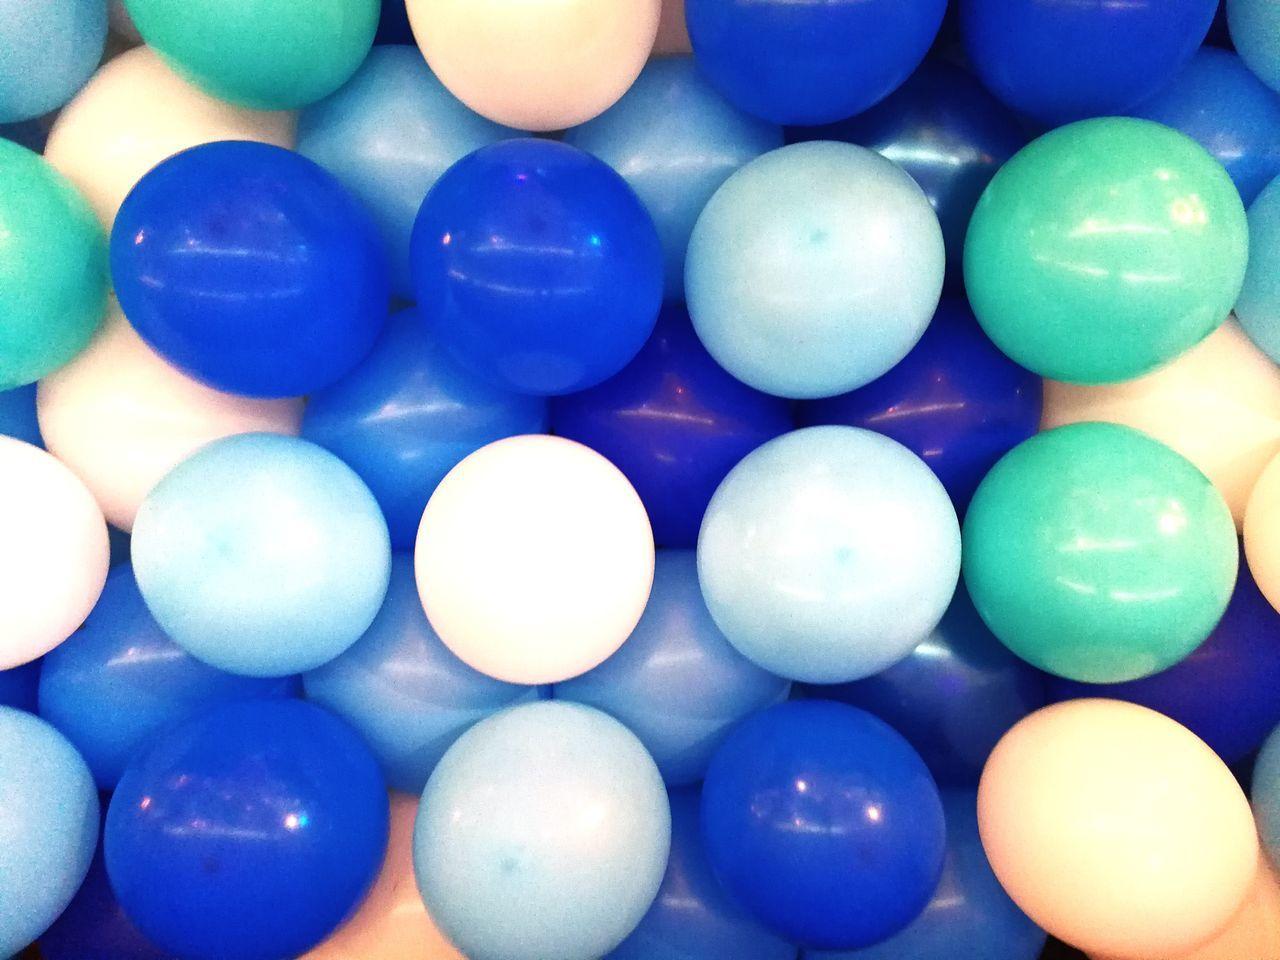 Balloons Blue Round Shape